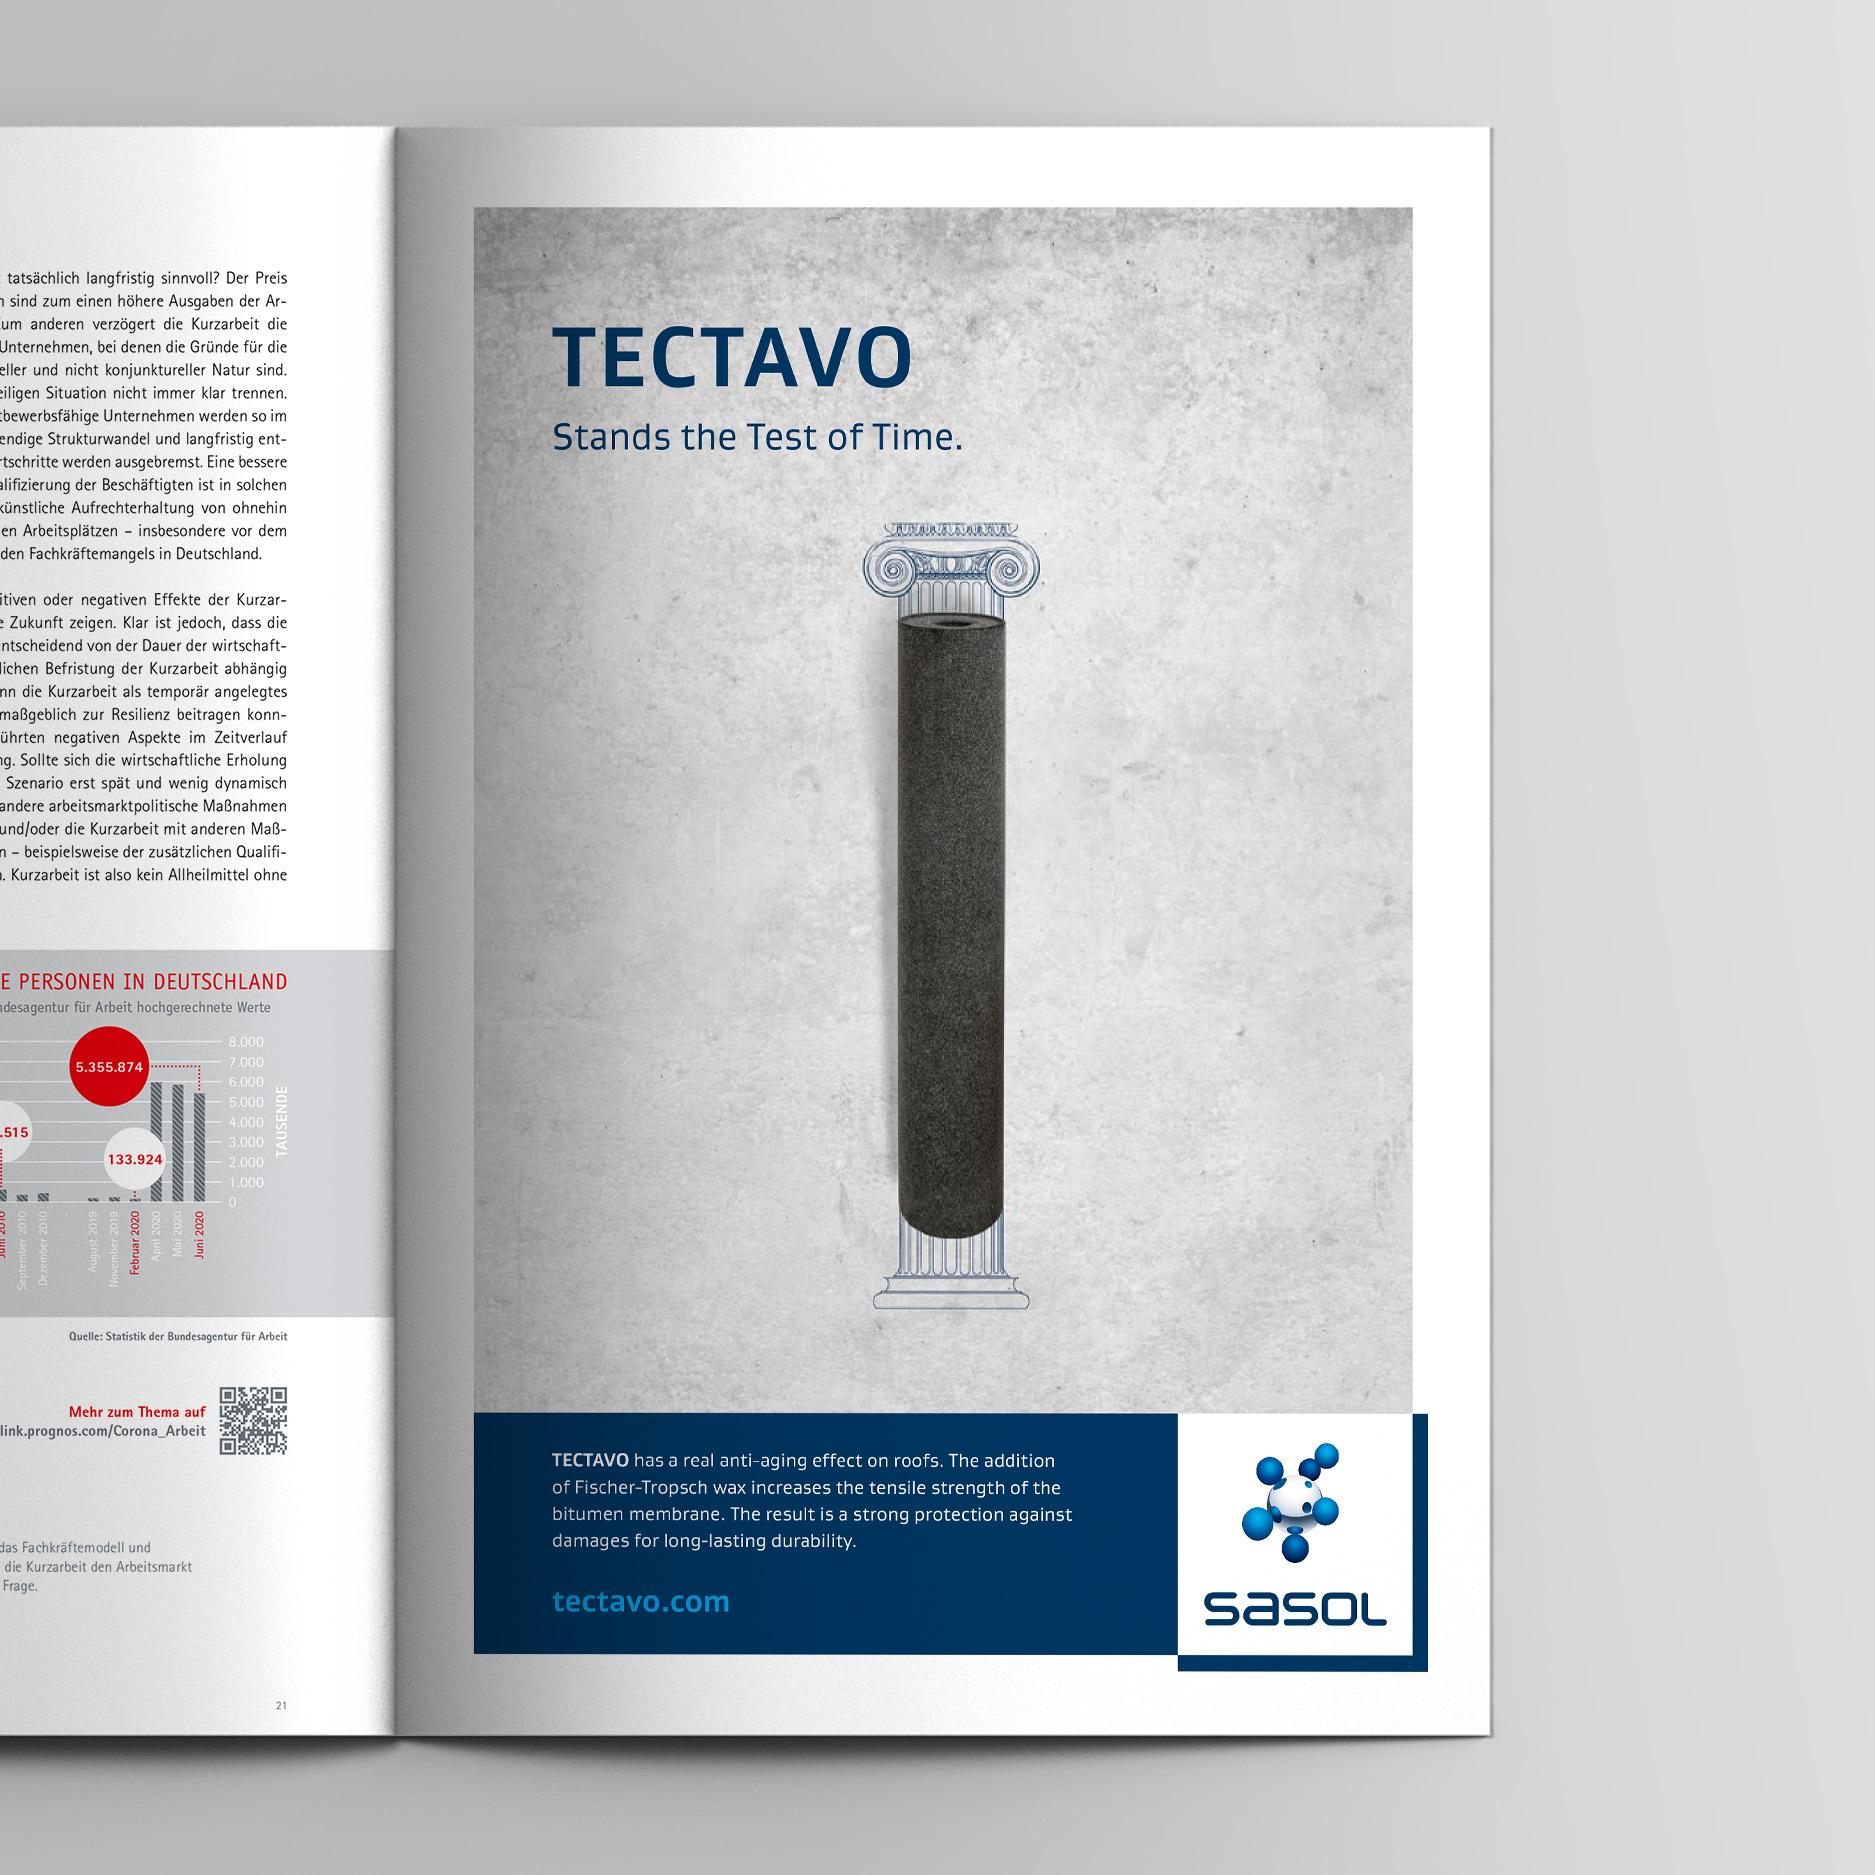 Keyvisual – Anzeige Langlebigkeit (Sasol, Tectavo Productlaunch)